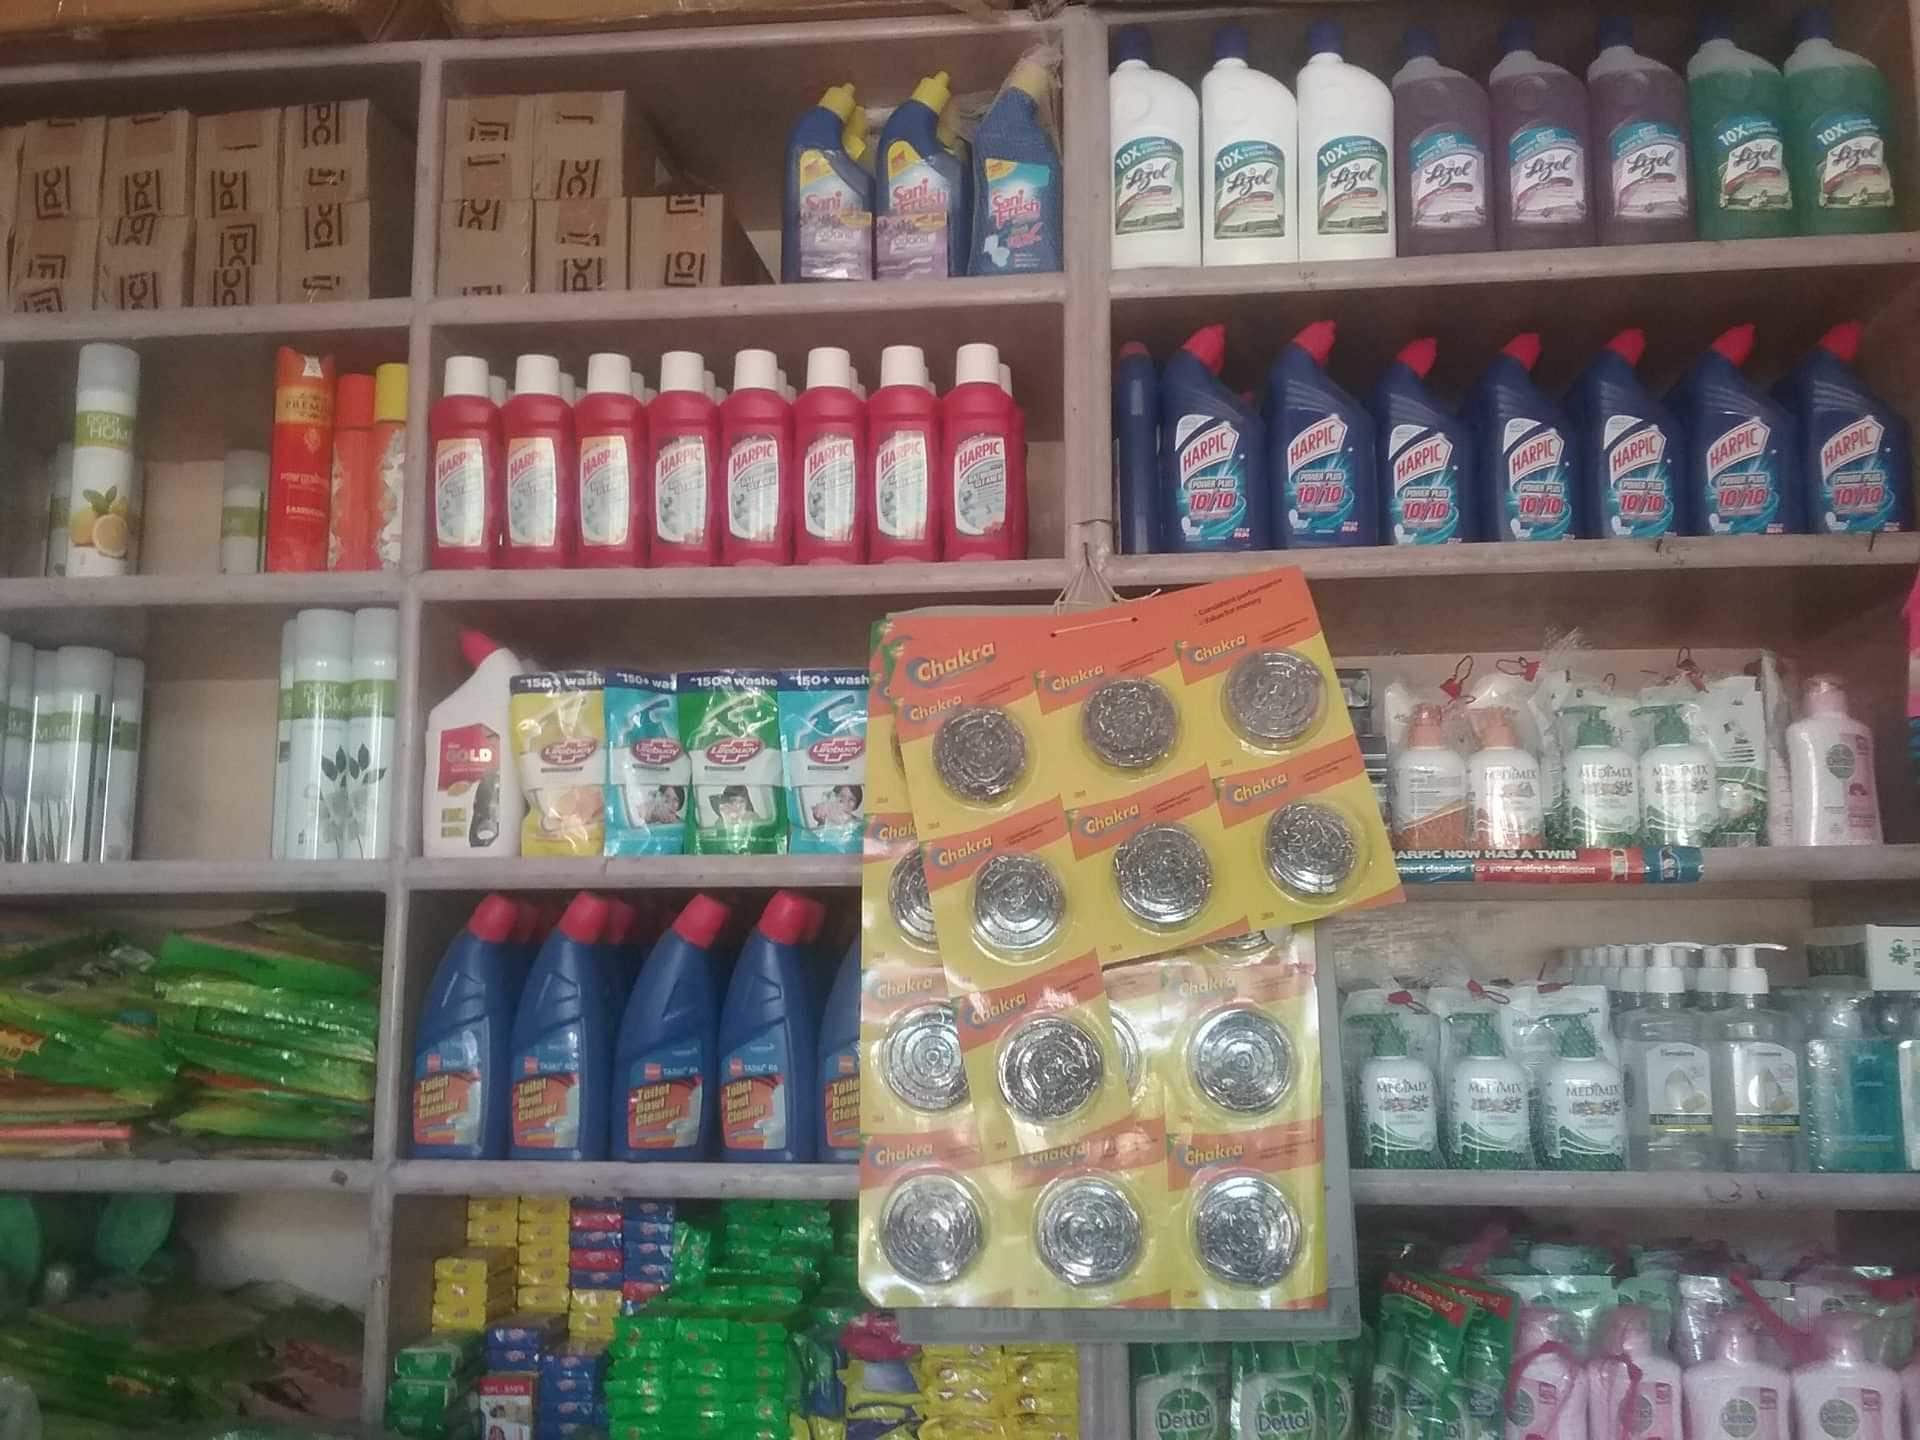 Top Phenyl Dealers in Jayalakshmipuram - Best Phenyl Suppliers